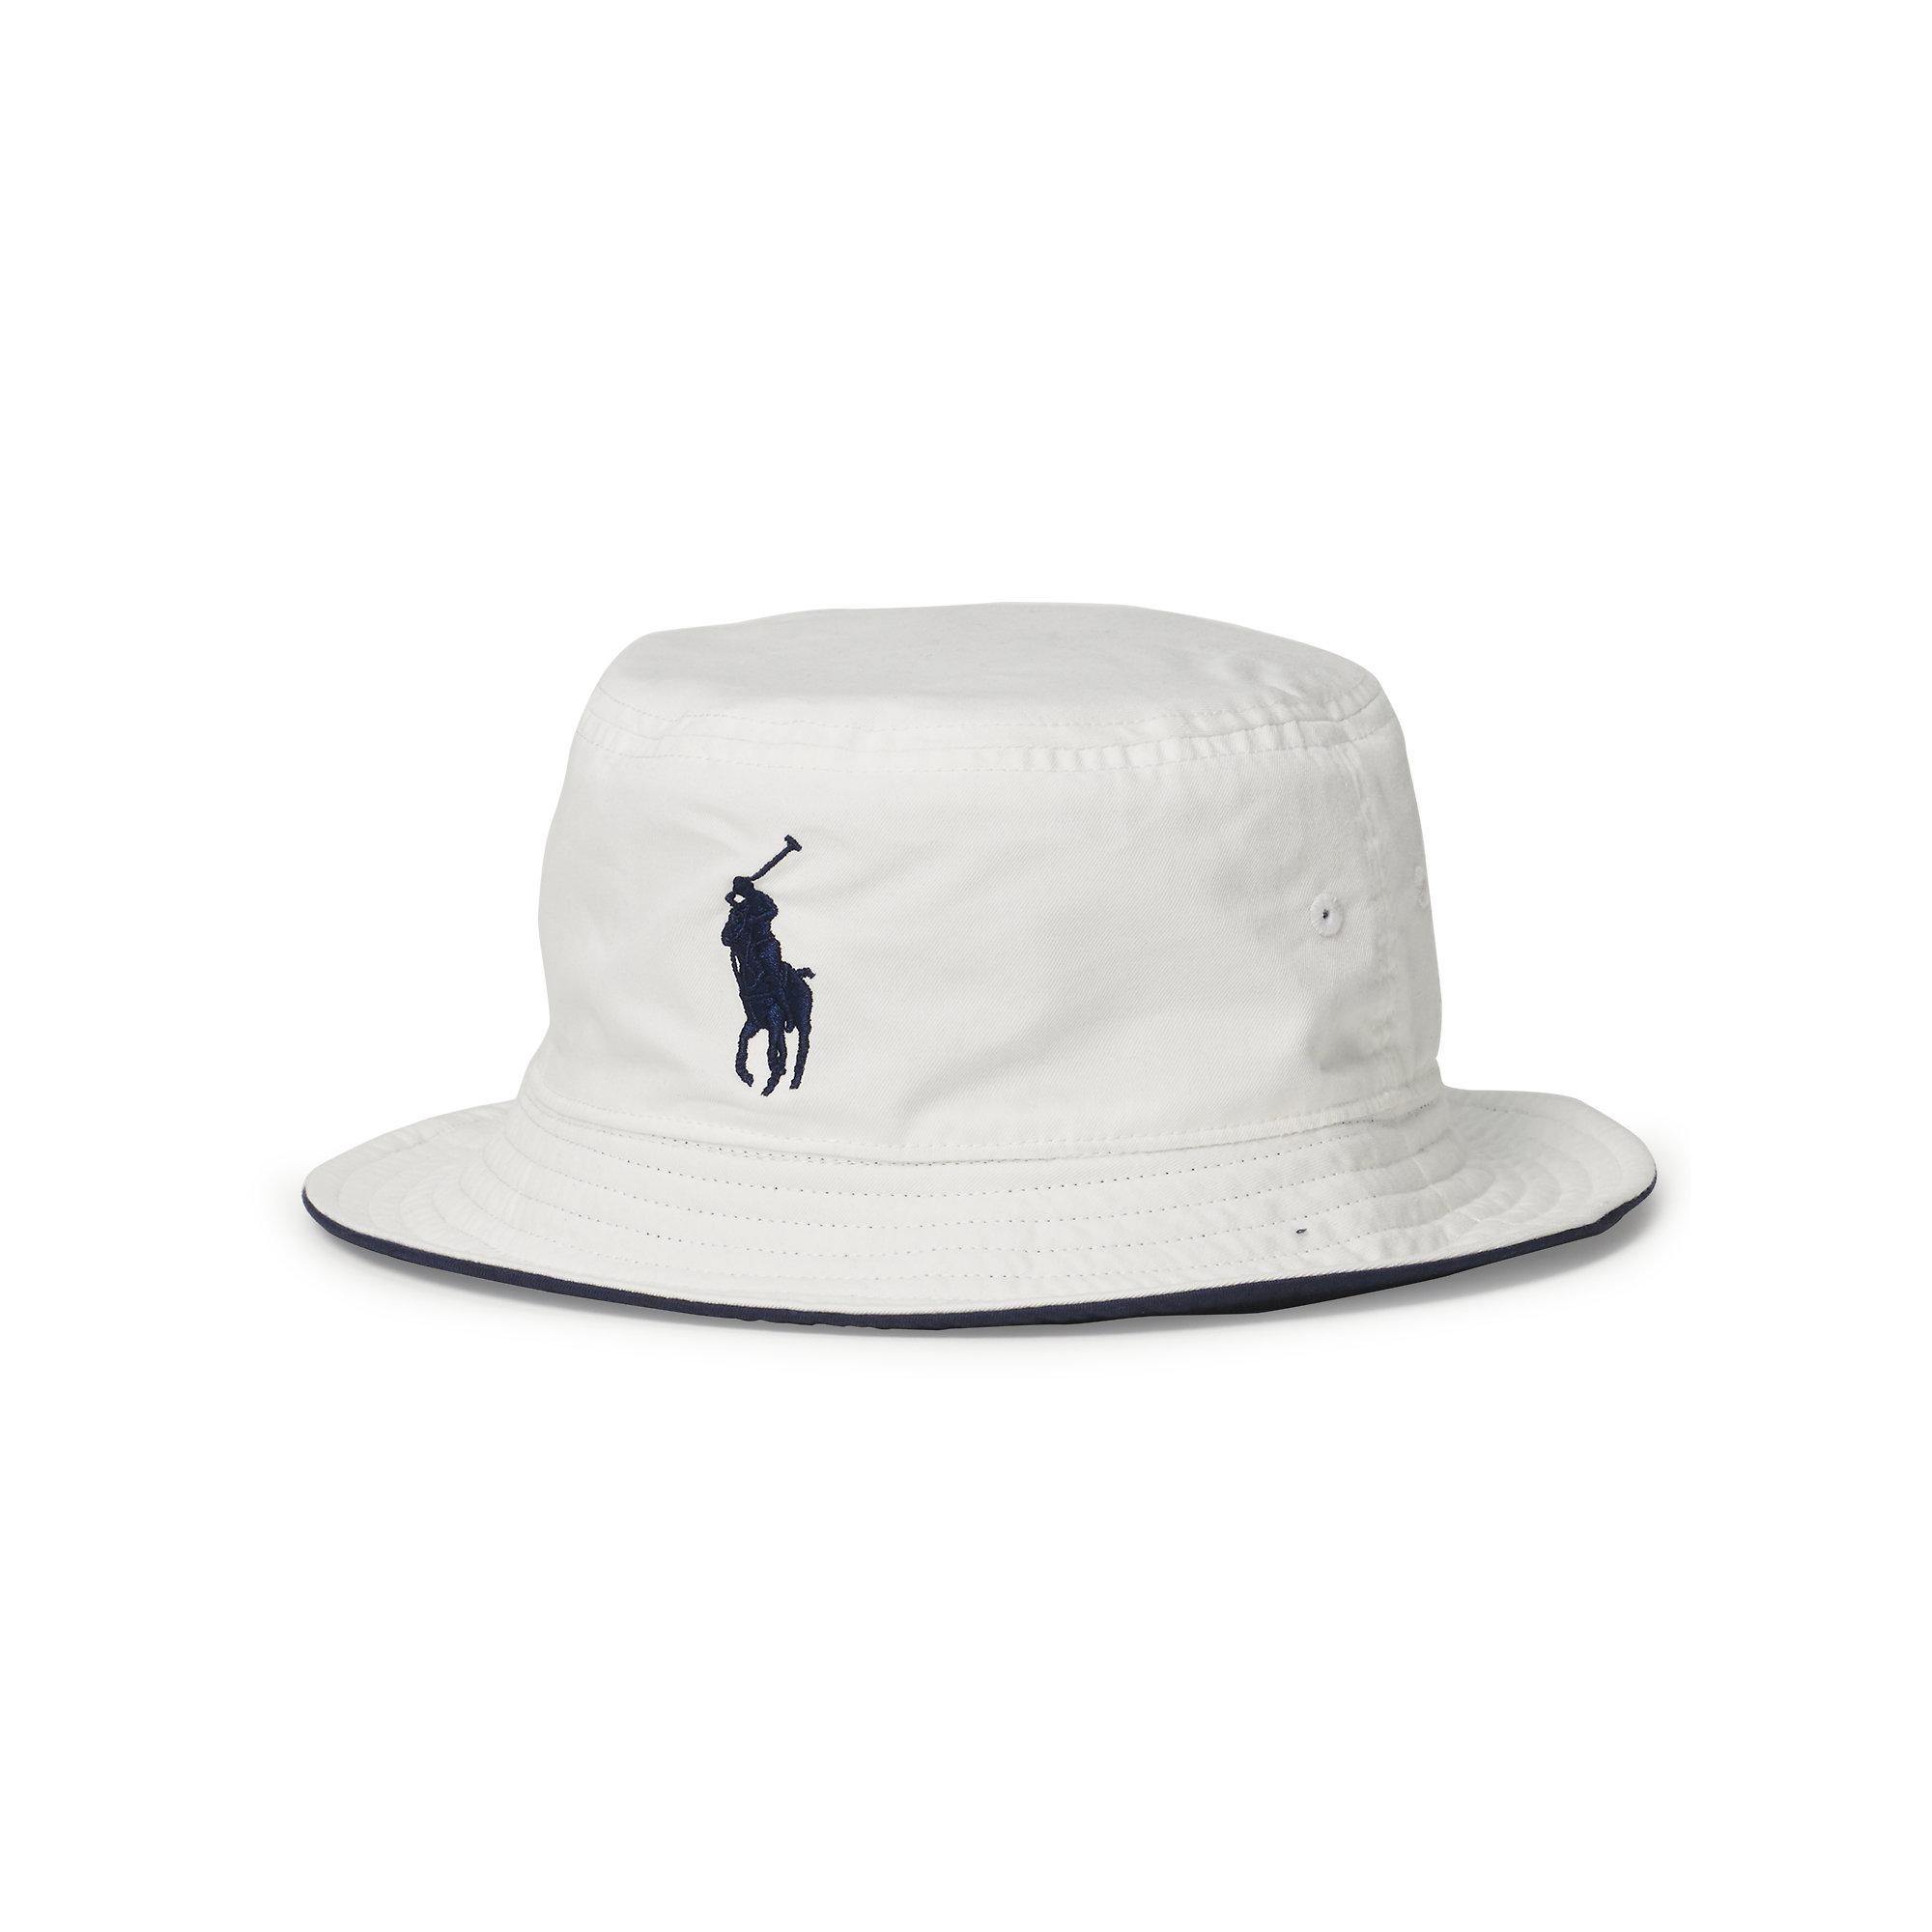 10cabea5f95 Lyst - Polo Ralph Lauren Us Open Reversible Bucket Hat in White for Men